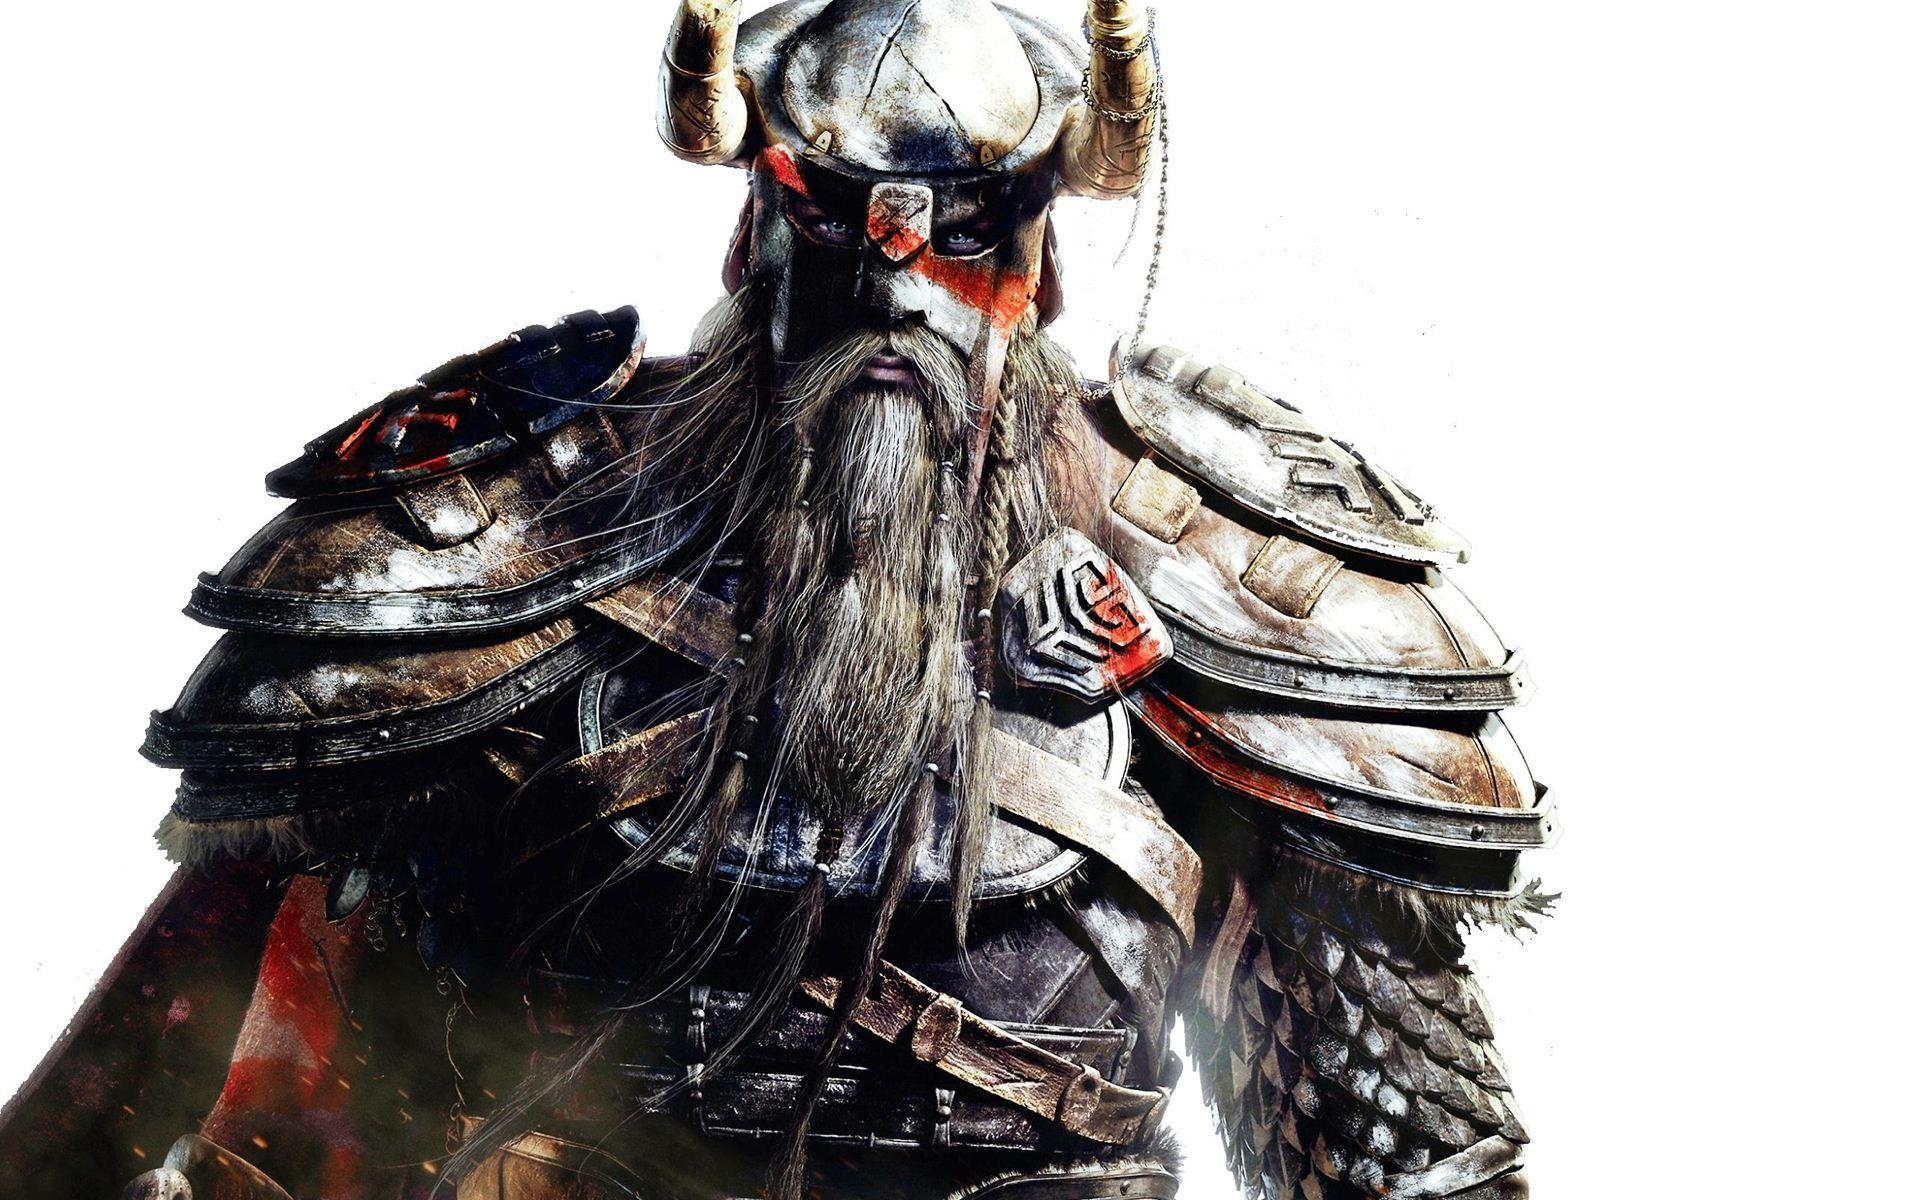 The Elder Scrolls Online Wallpapers, Pictures, Images